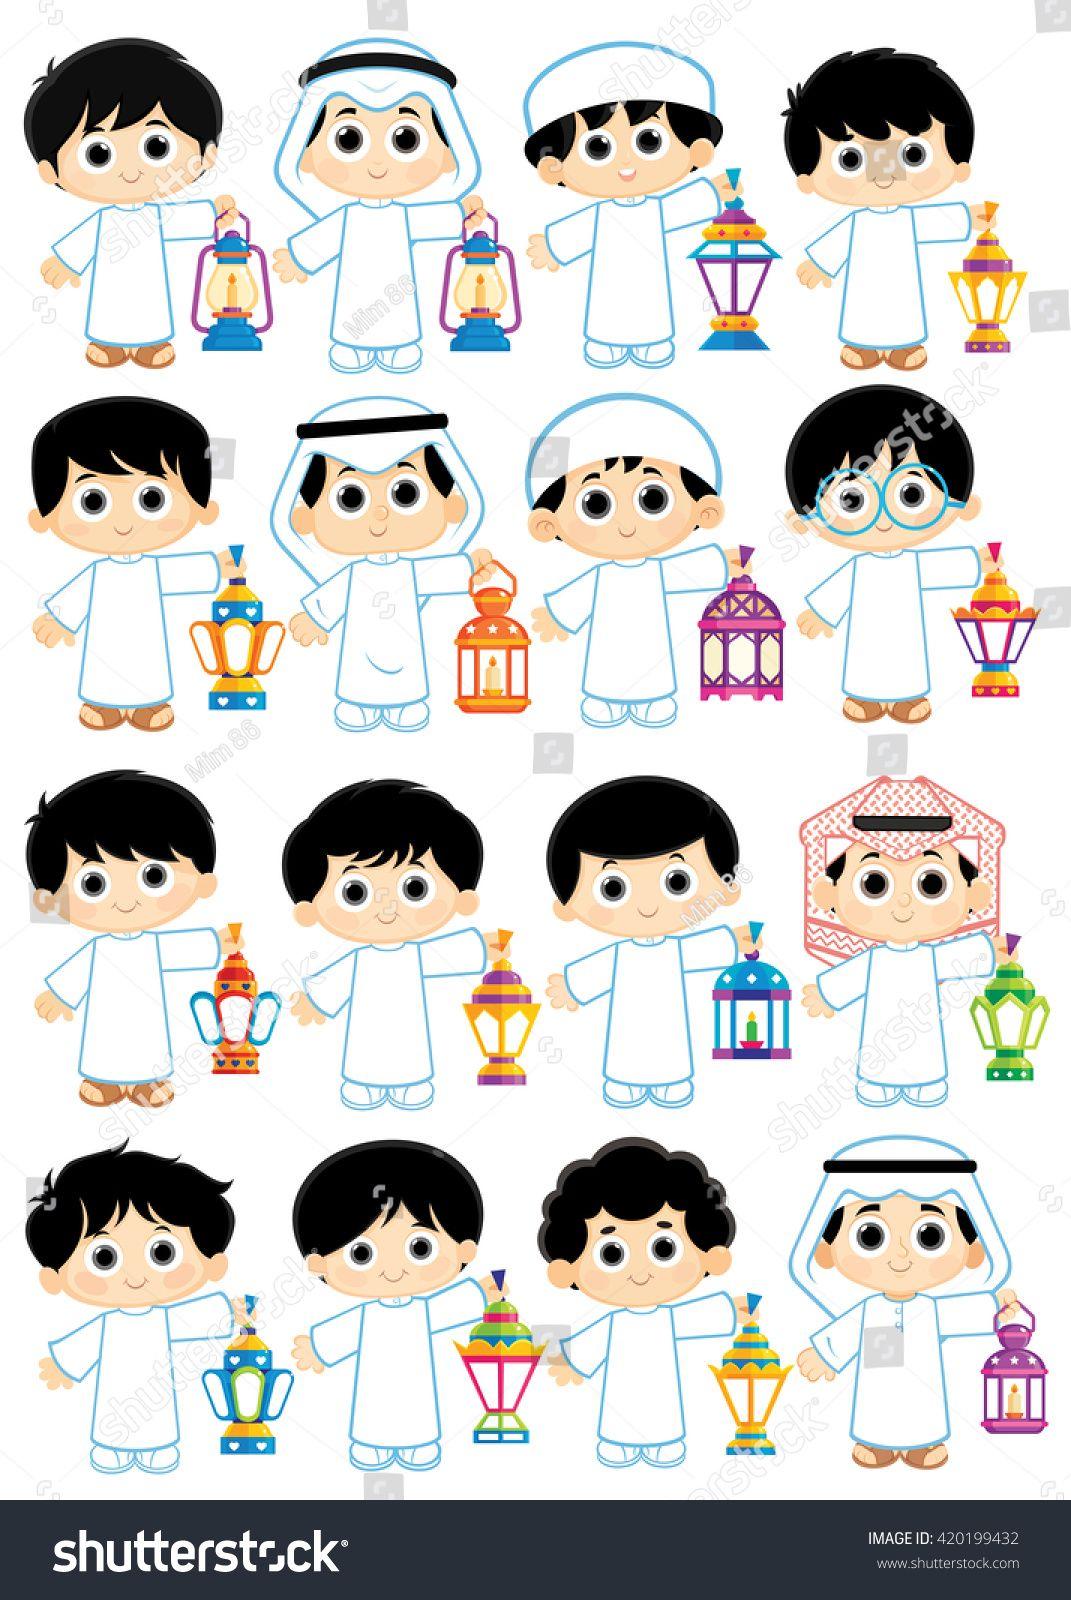 Set Of 16 Arab Kids Celebrating Ramadan And Carrying